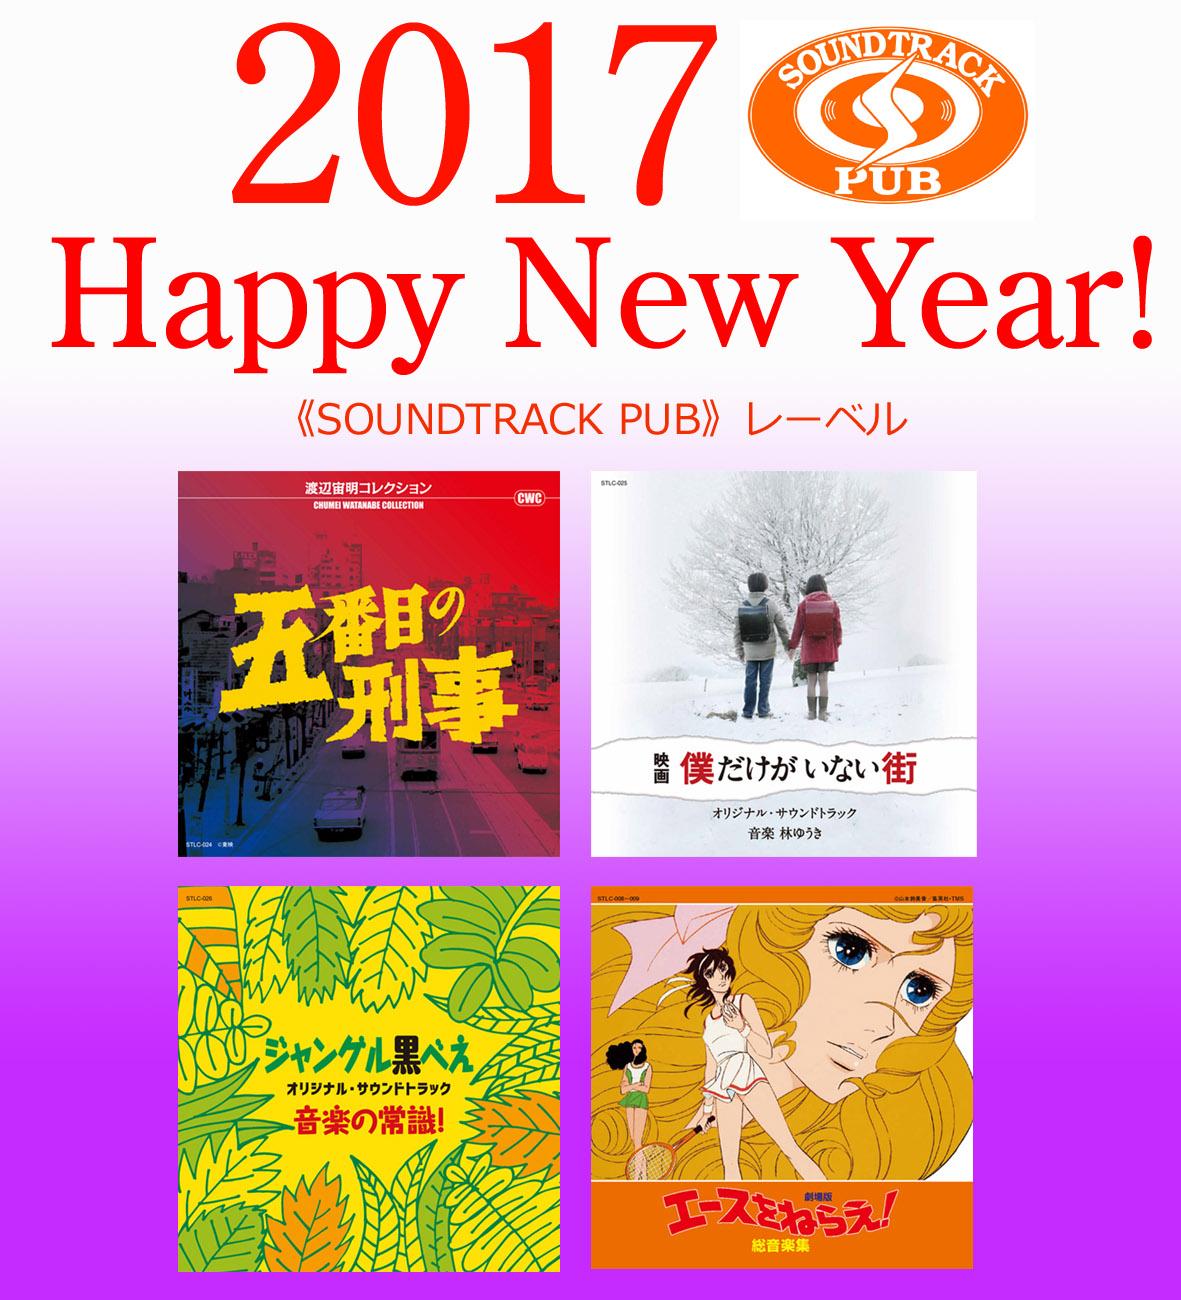 2017年賀SoundtracPub.jpg